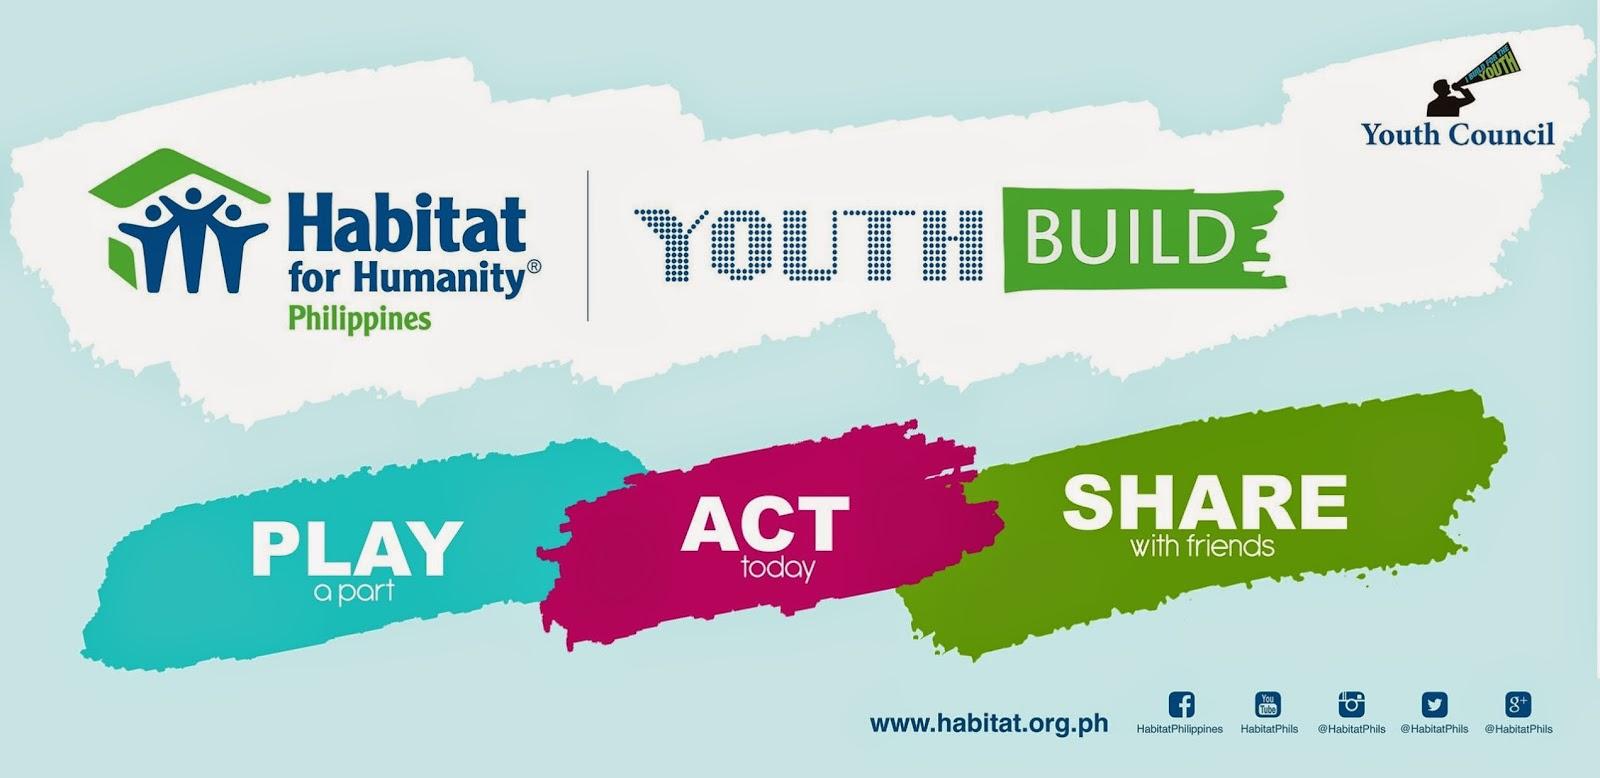 Habitat Youth Build 2015